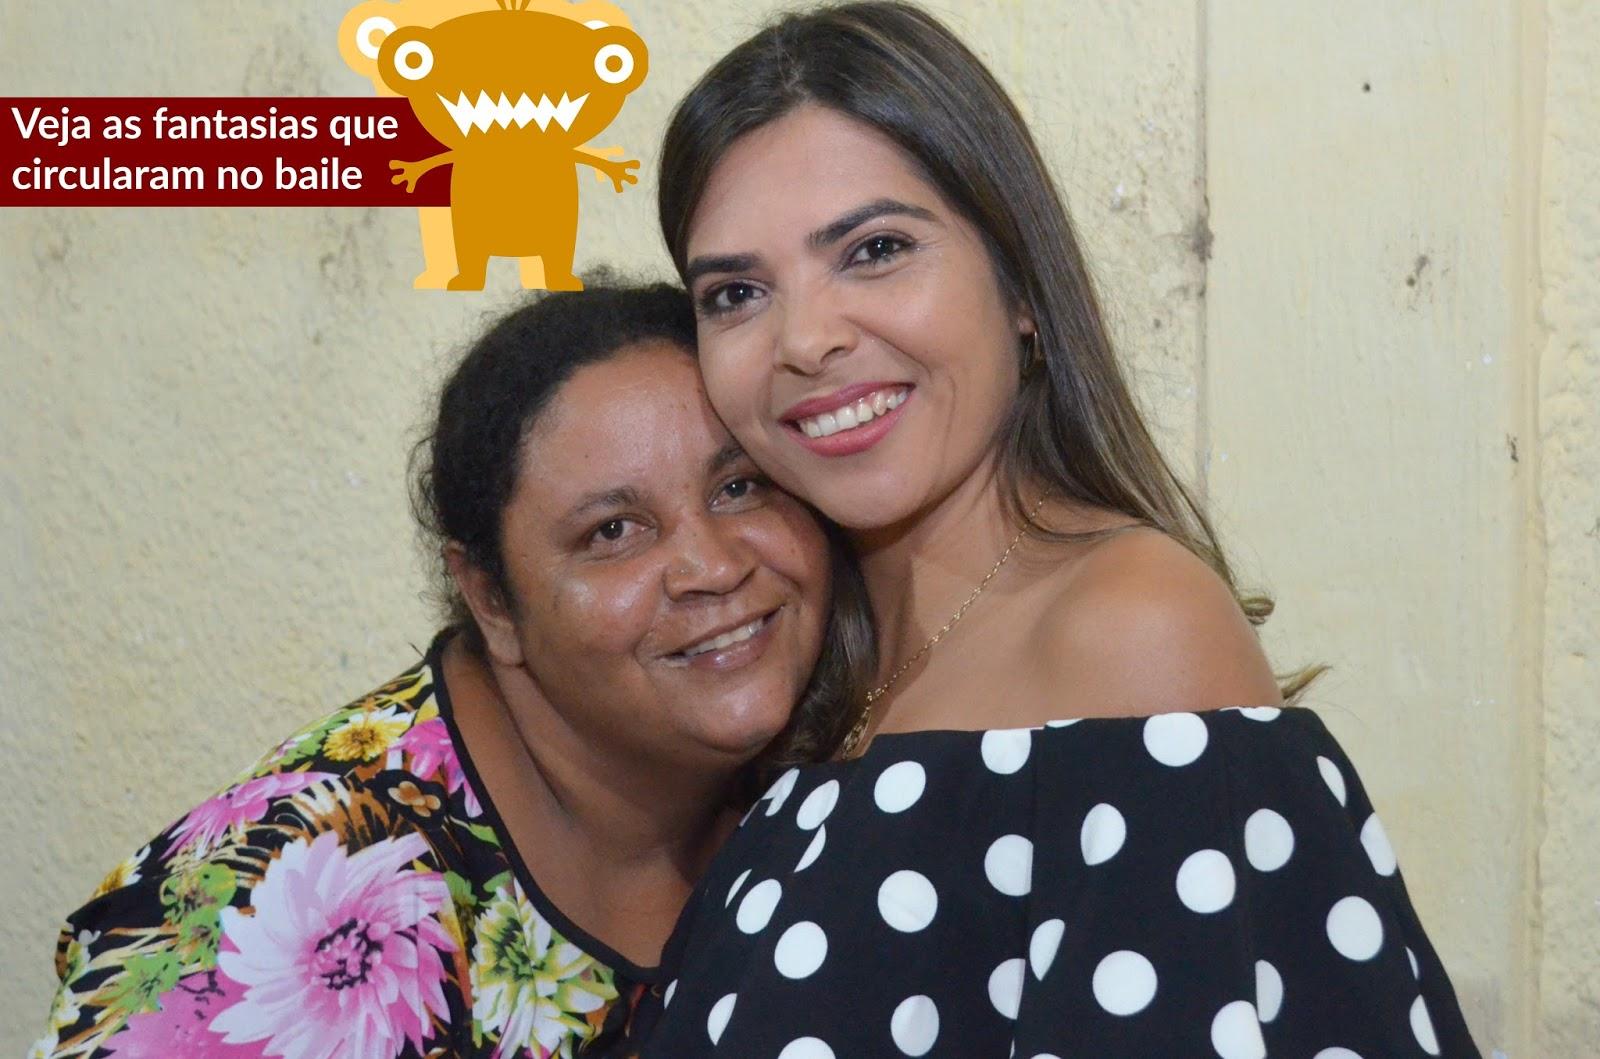 Foto: Will Assunção/Jussi Up Press